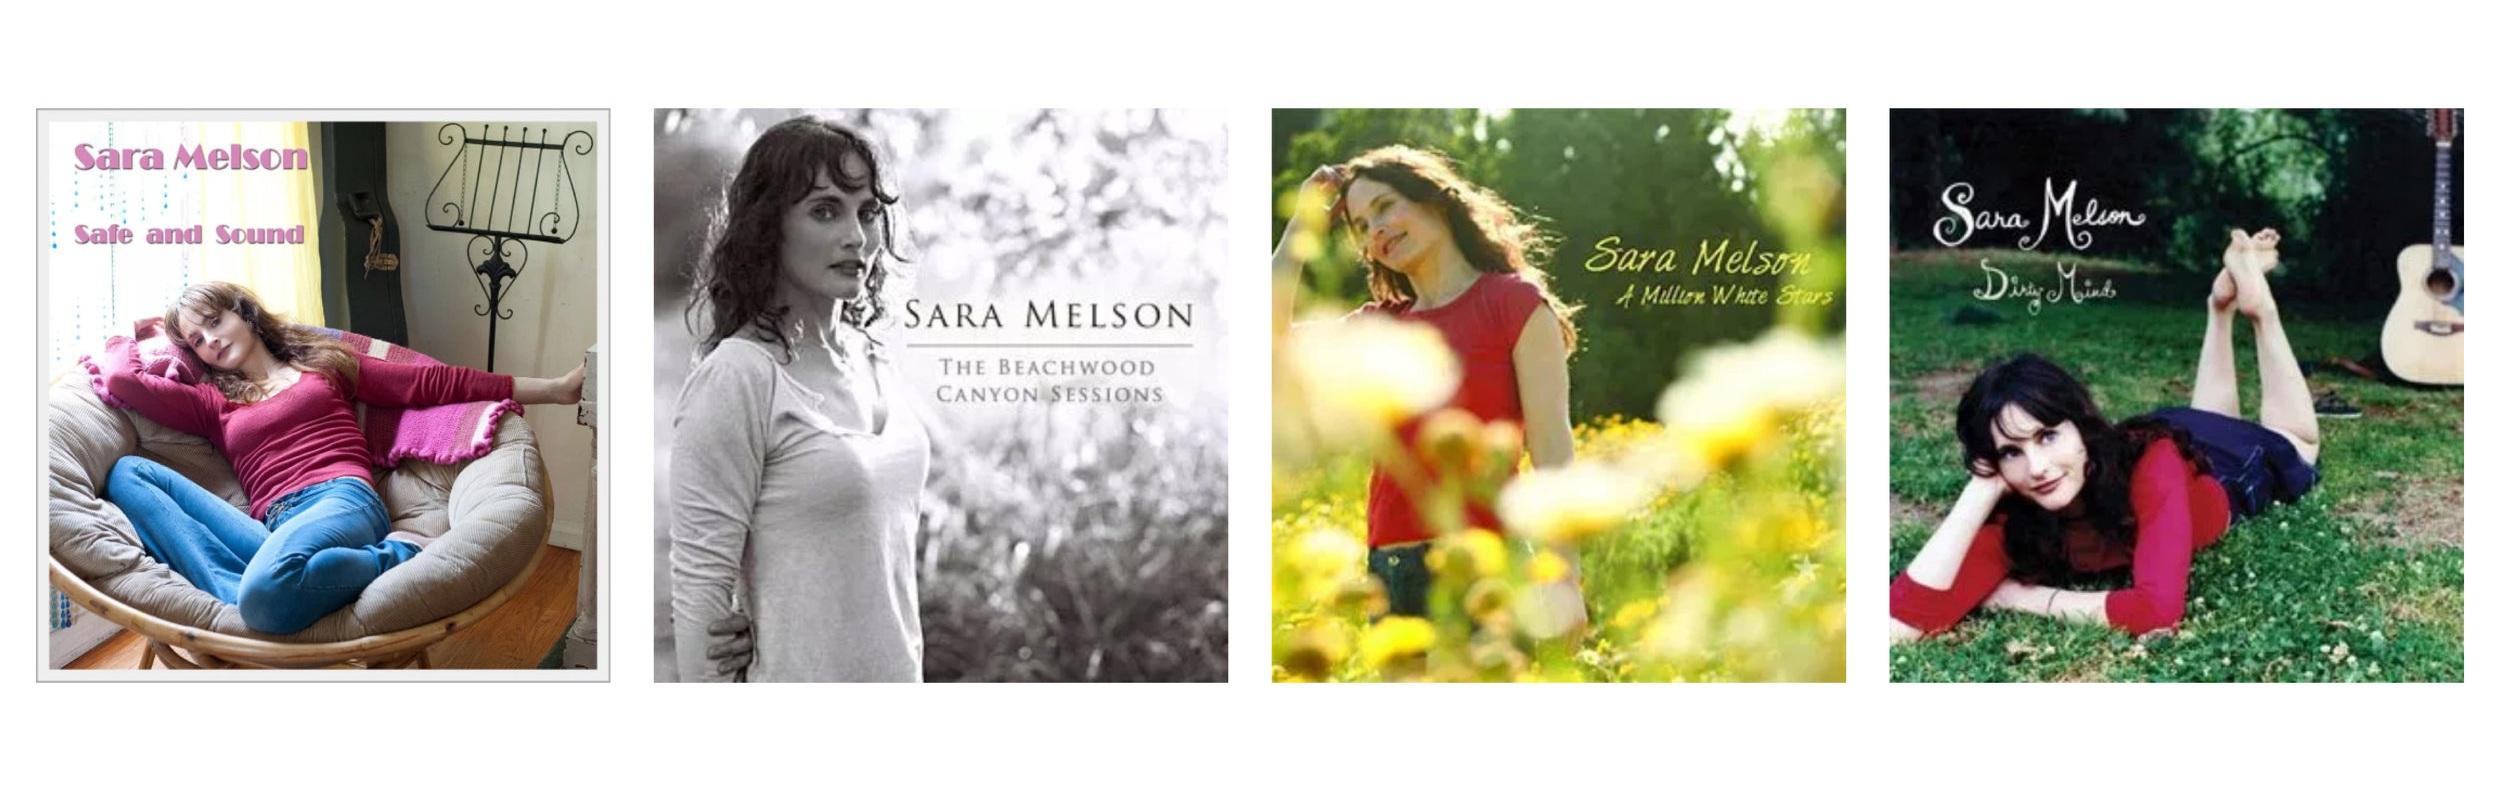 Sara Melson Website Design by Kenzi Green Design